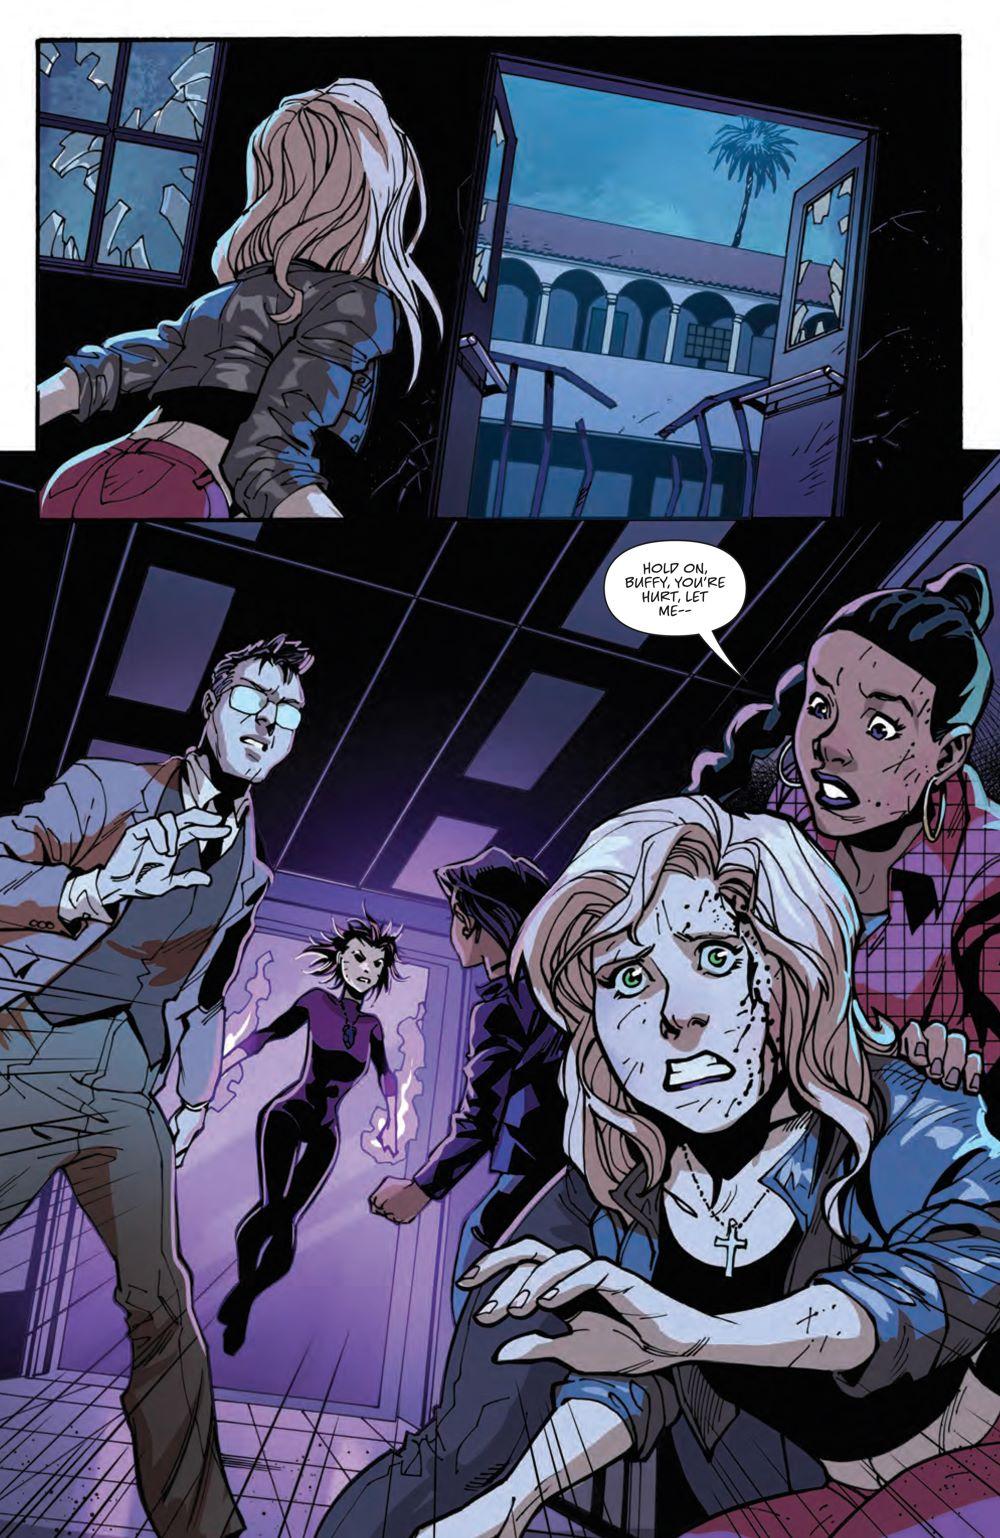 Buffy_024_PRESS_4 ComicList Previews: BUFFY THE VAMPIRE SLAYER #24